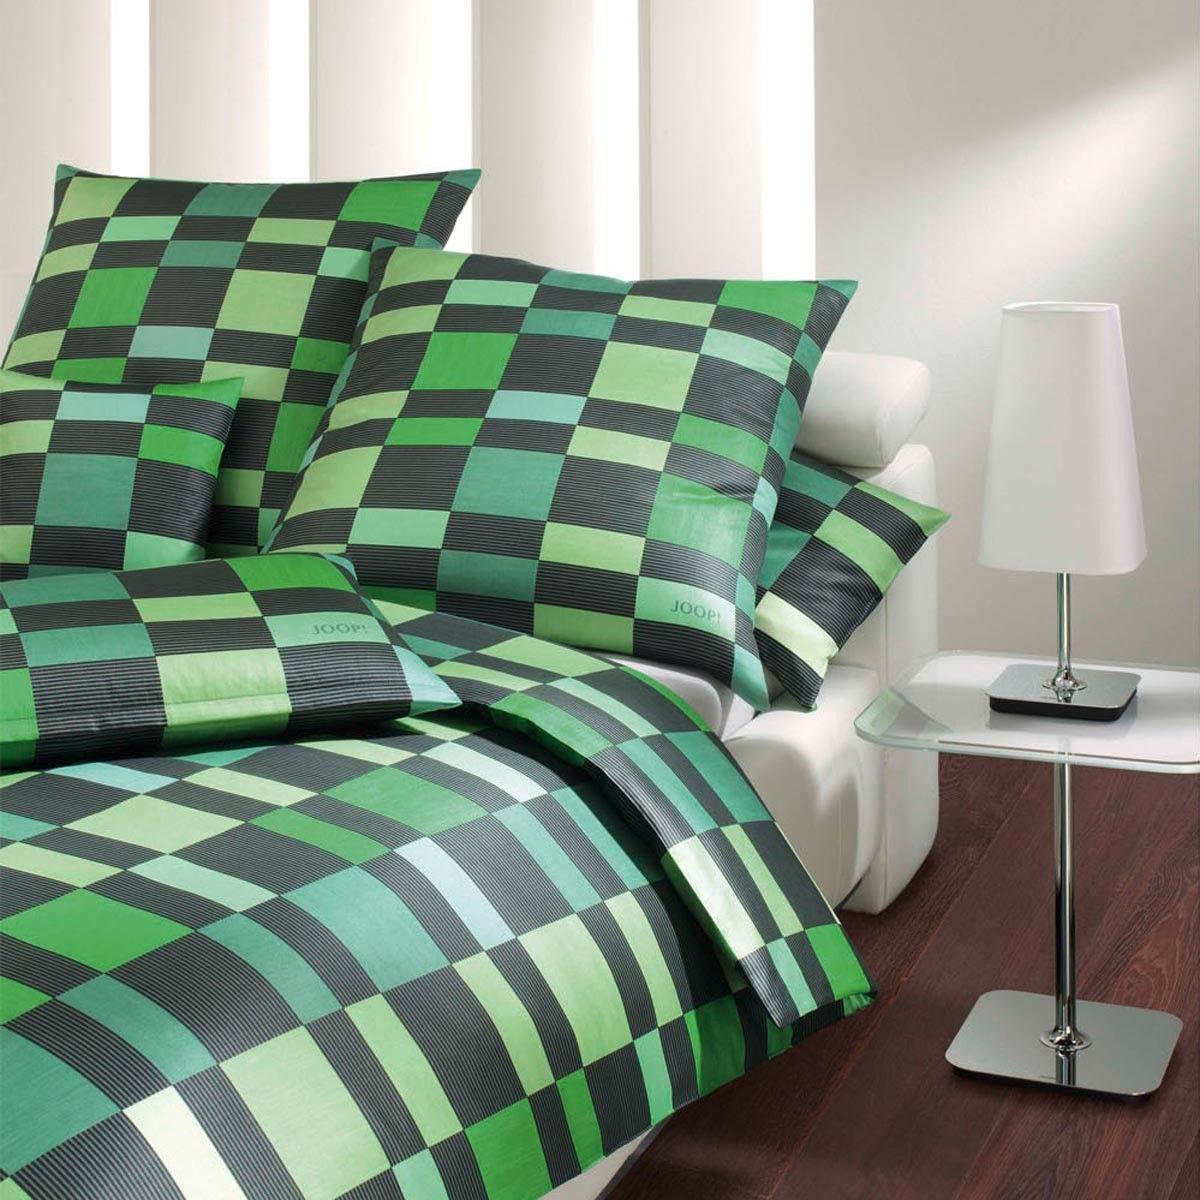 joop! bettwäsche rapid squares kiwi 4044-4 | kiwi and squares, Schlafzimmer entwurf